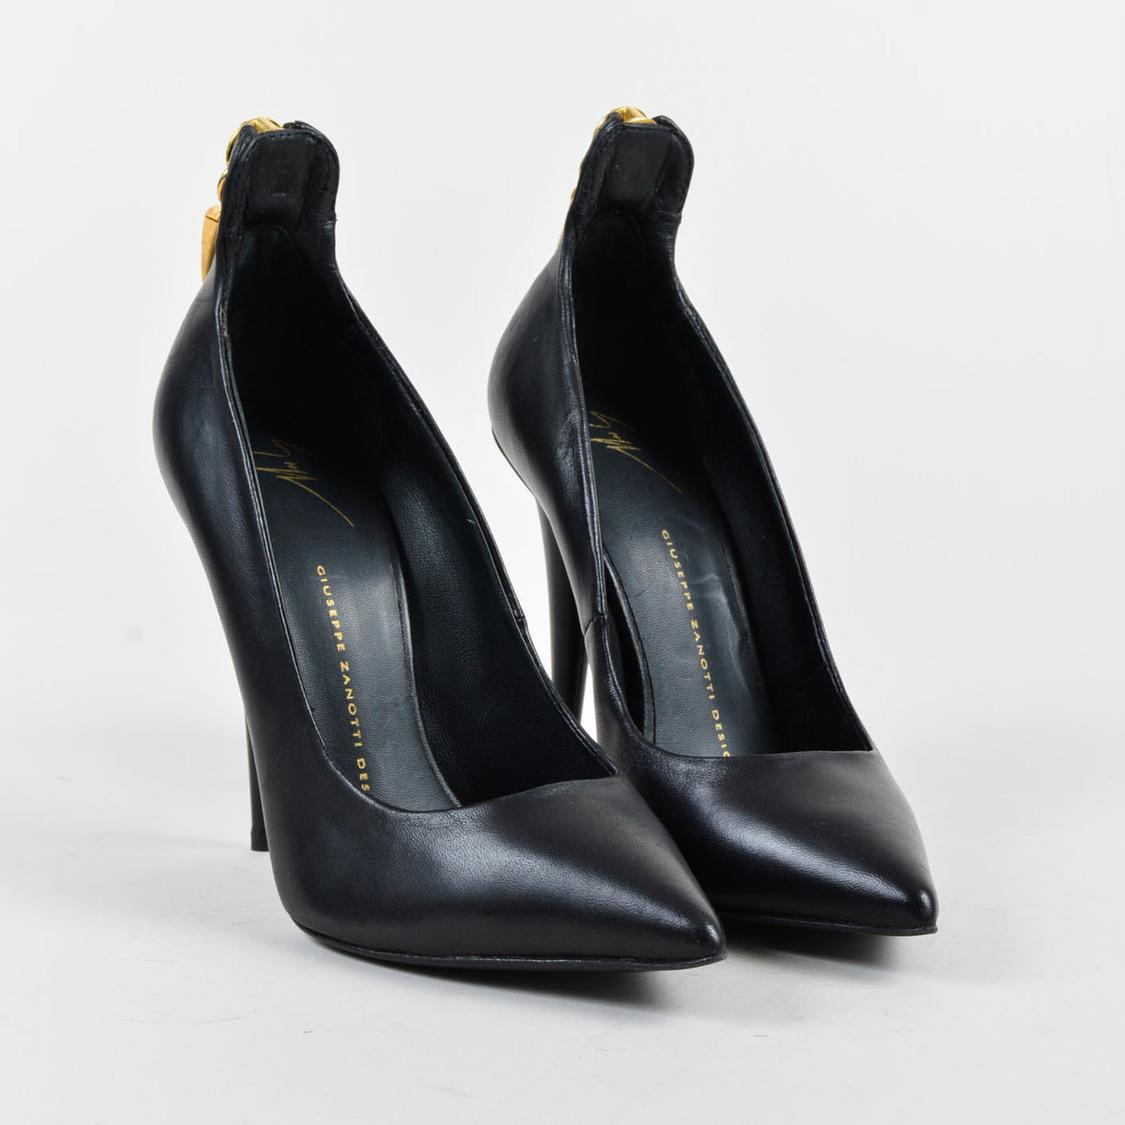 Stella McCartney Pointed Toe Trainers Sz385/55